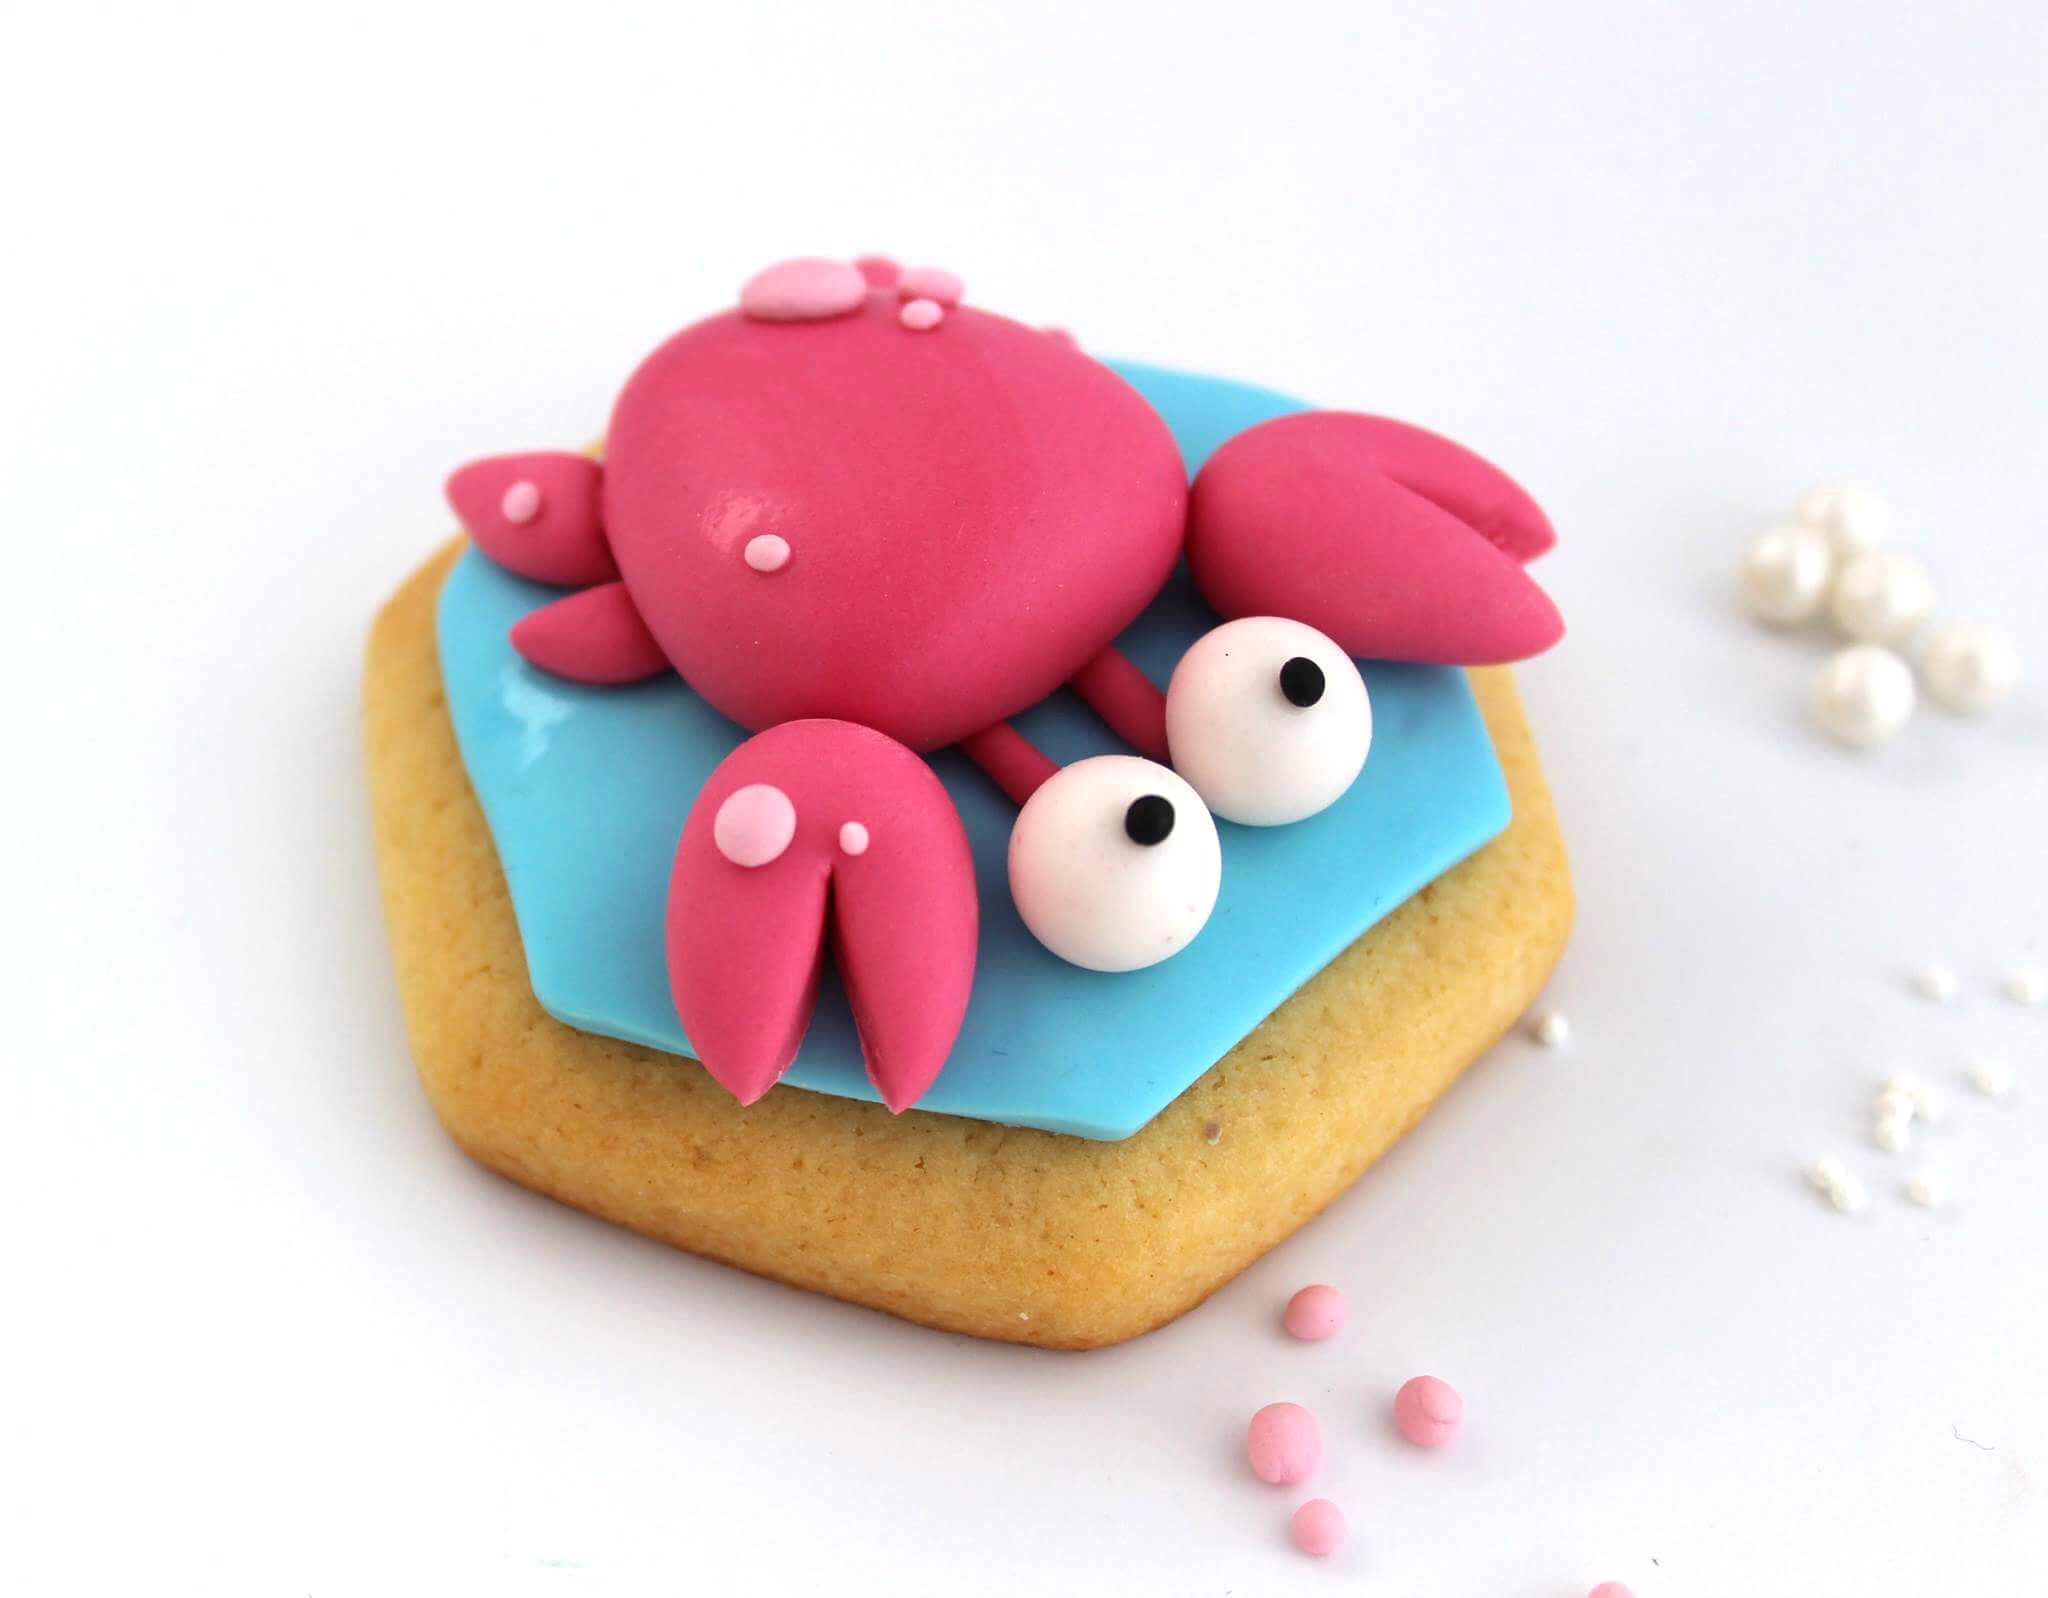 sff17_CrabTutorial-Monique-Ascanelli-The-Cake-Topper-Step6.JPG#asset:17077